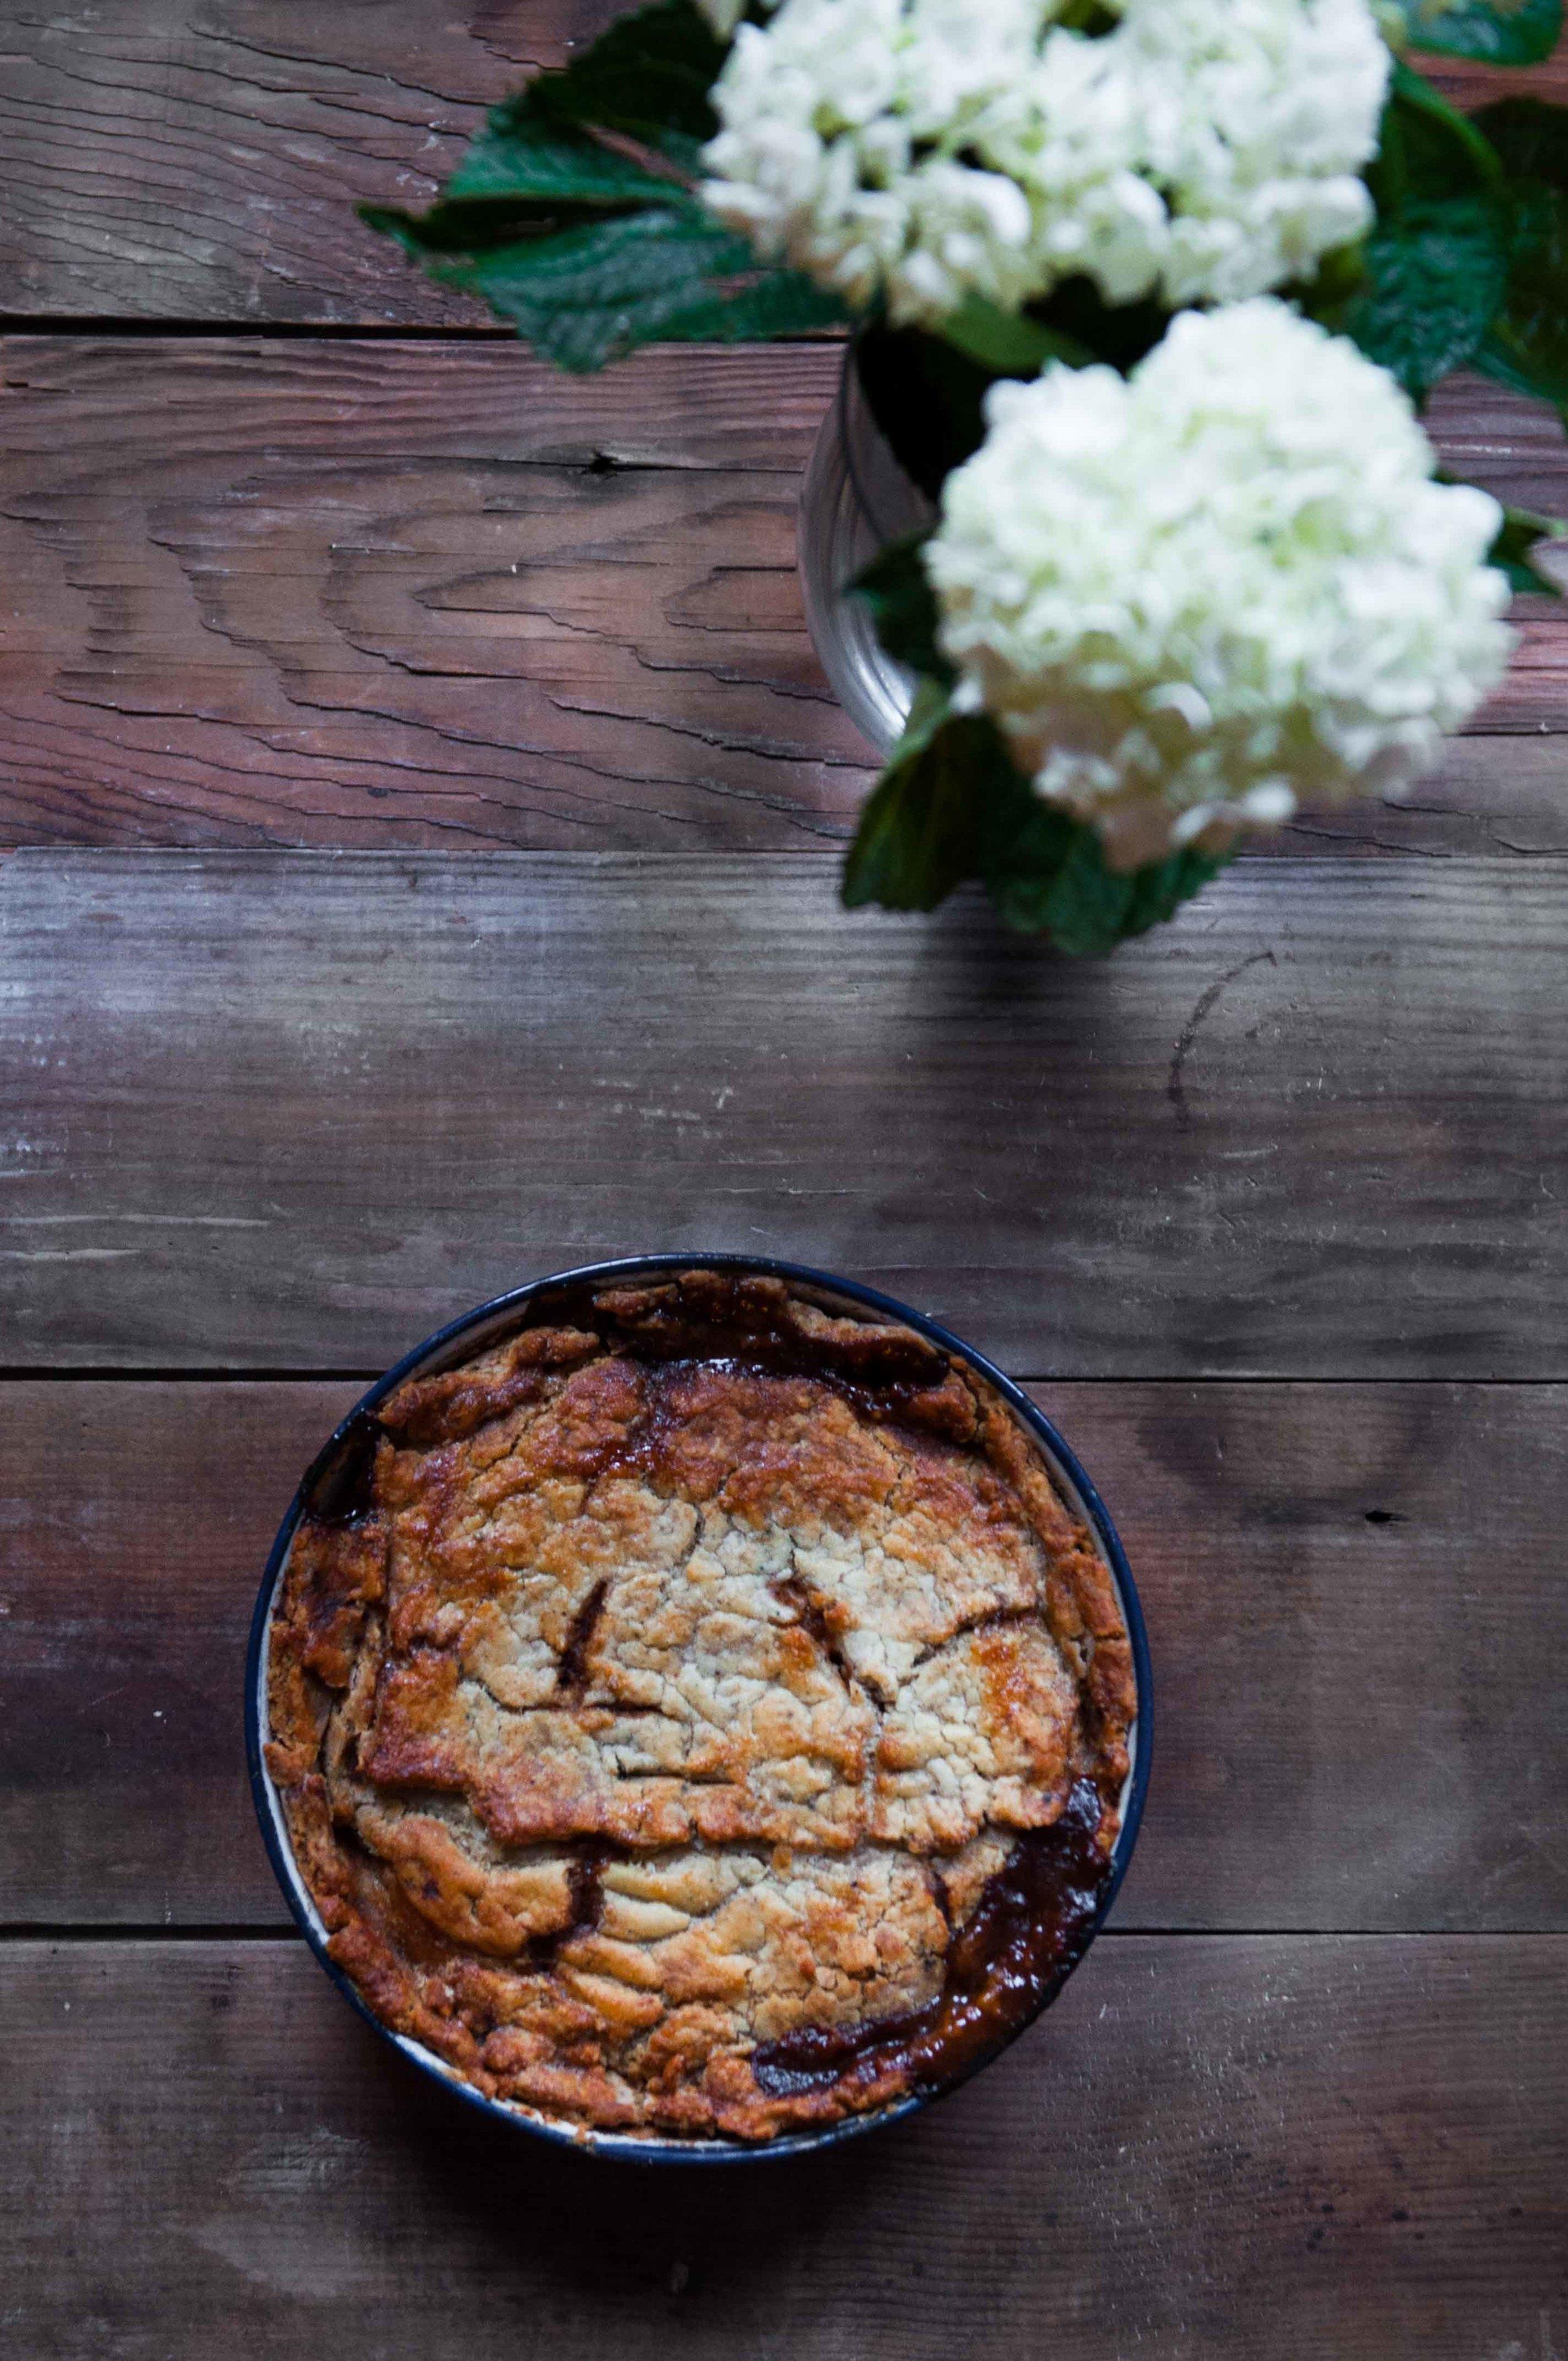 Gluten Free Curried Irish Beef Pot Pie with a Tallow Crust made with gluten free flour blend